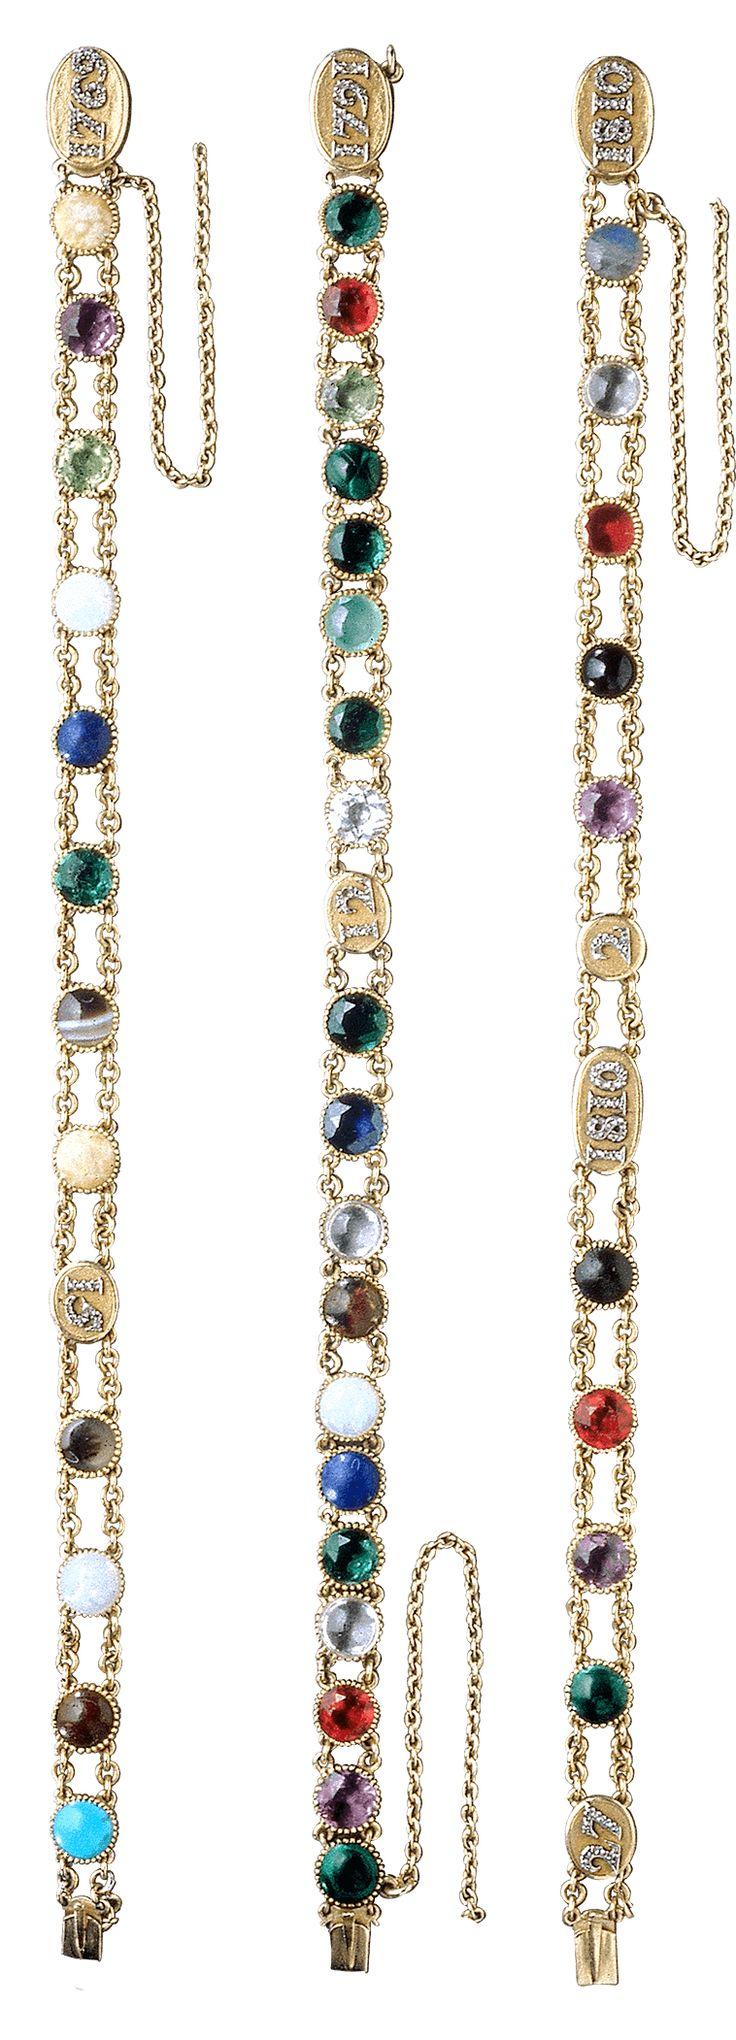 Bracelets c1810, Empress Marie-Louise